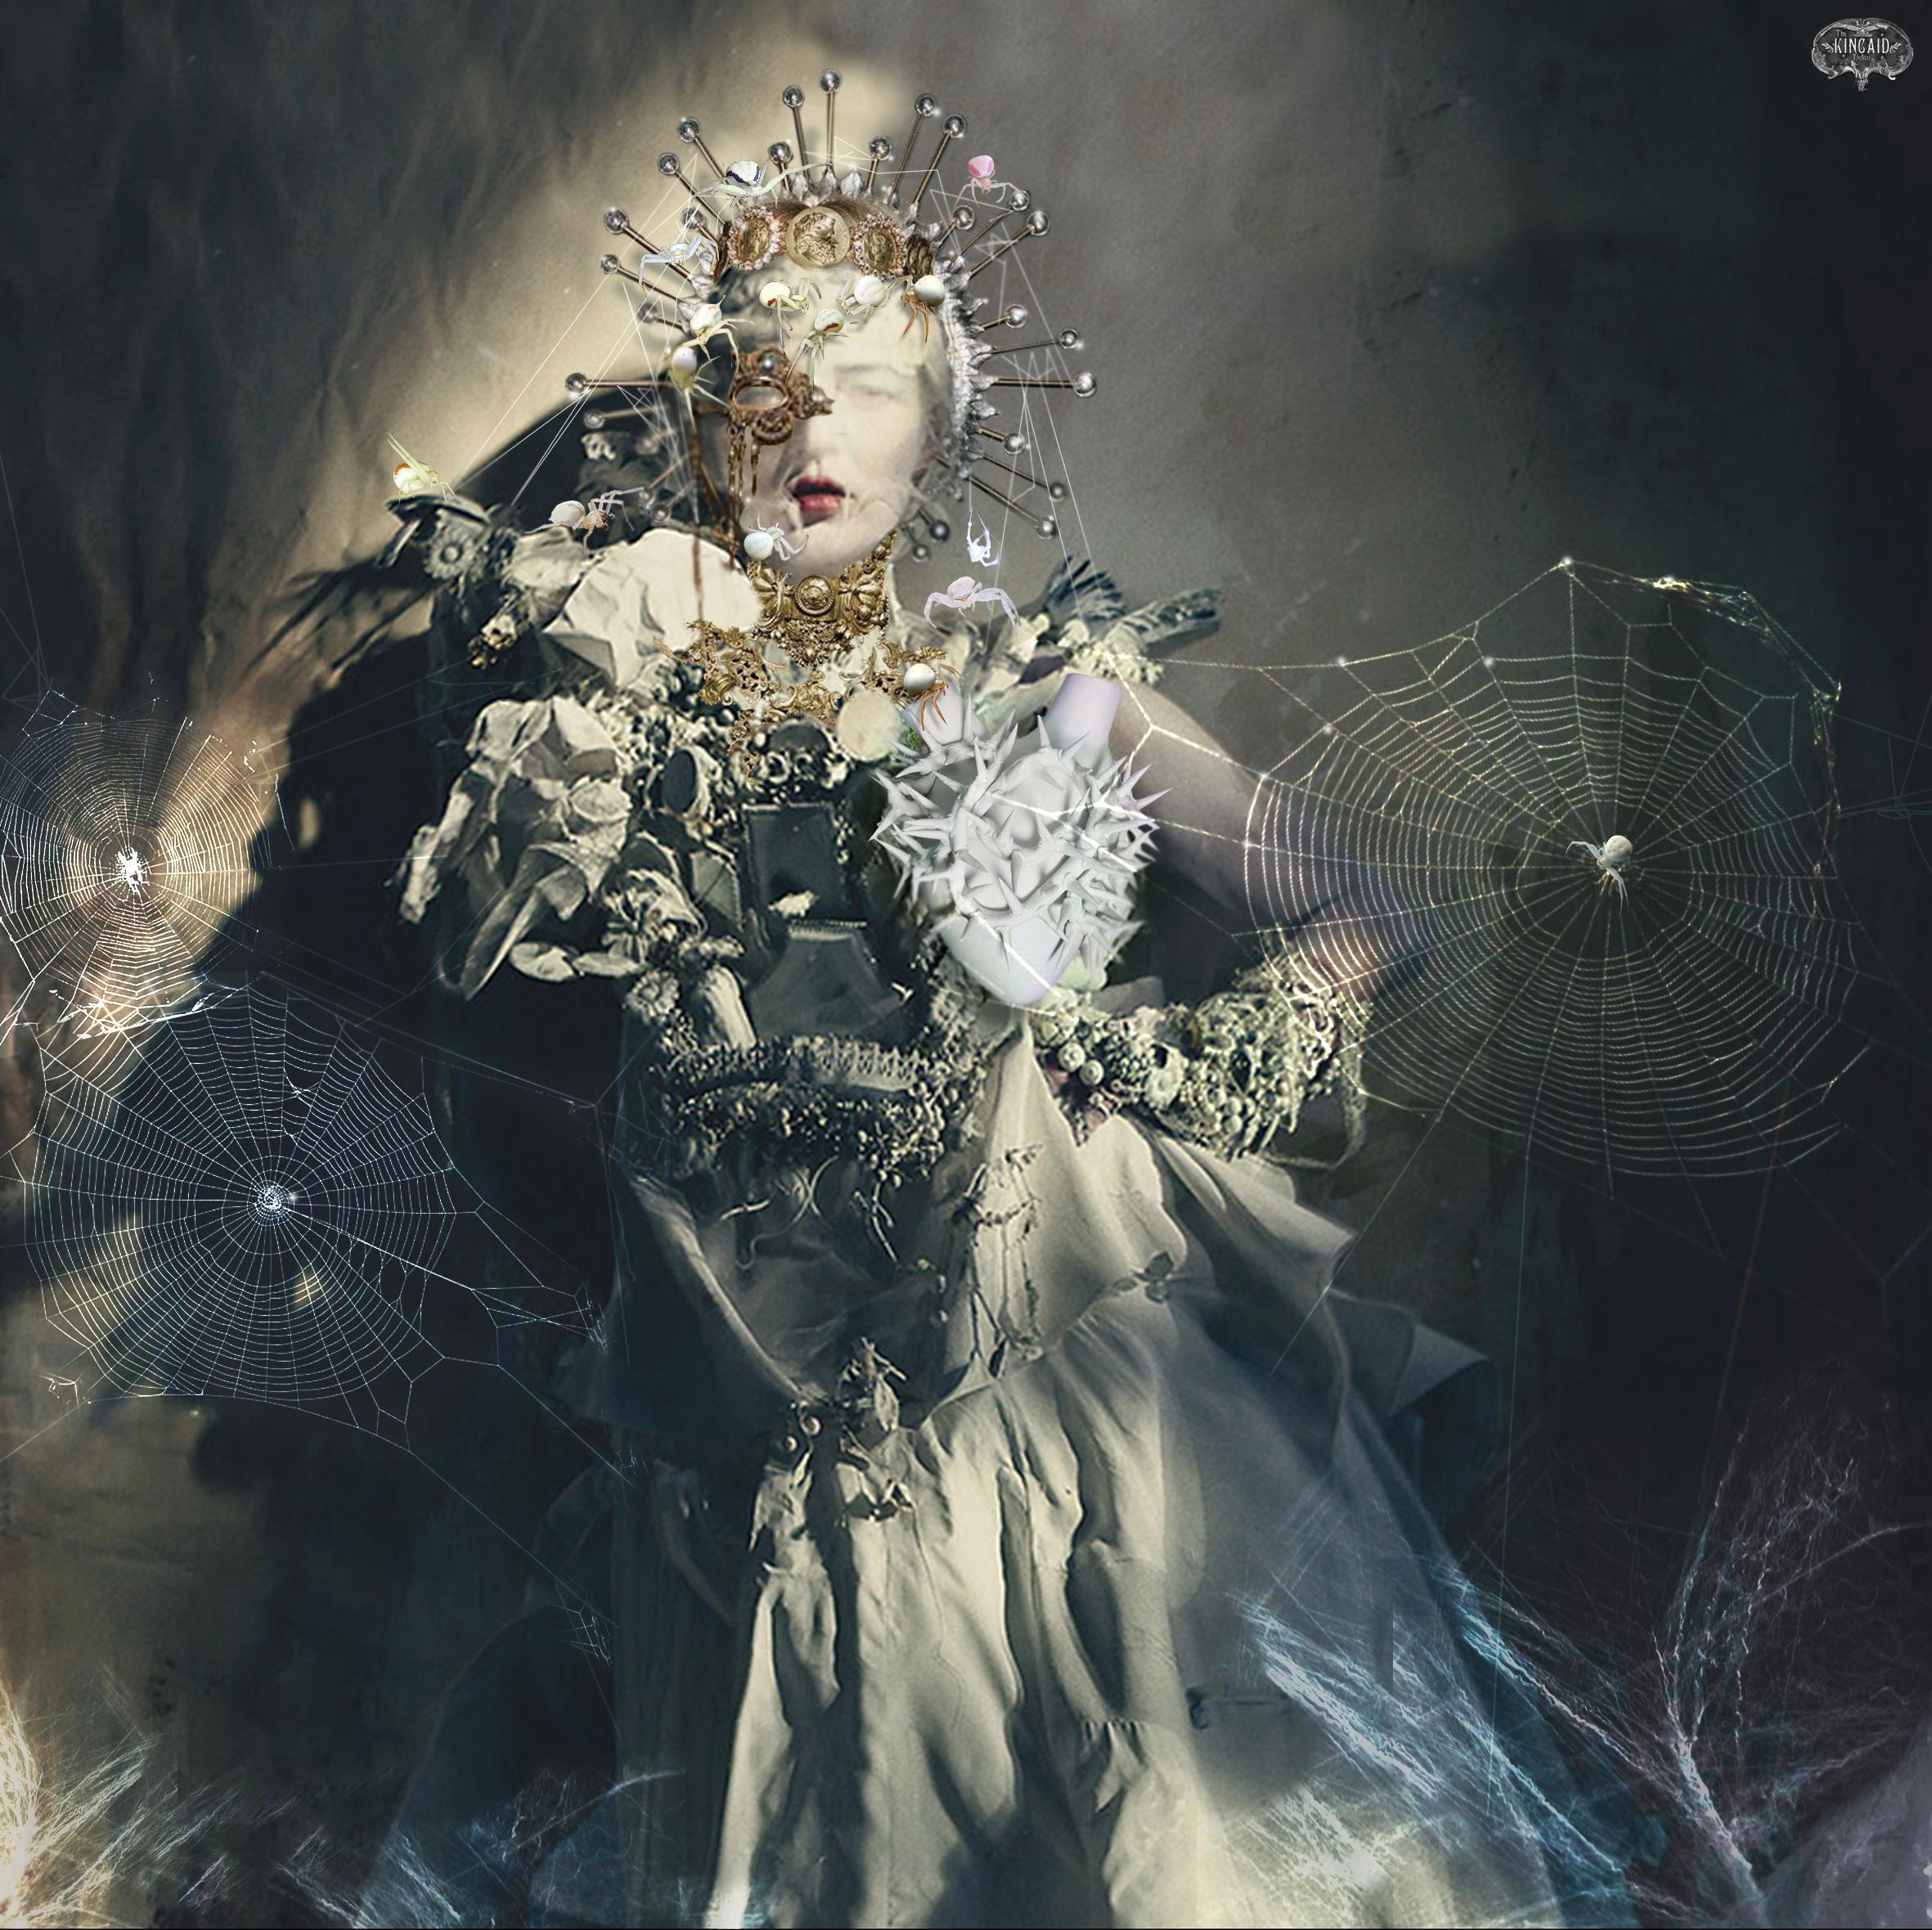 cydonia white lady numerique 2015.jpg